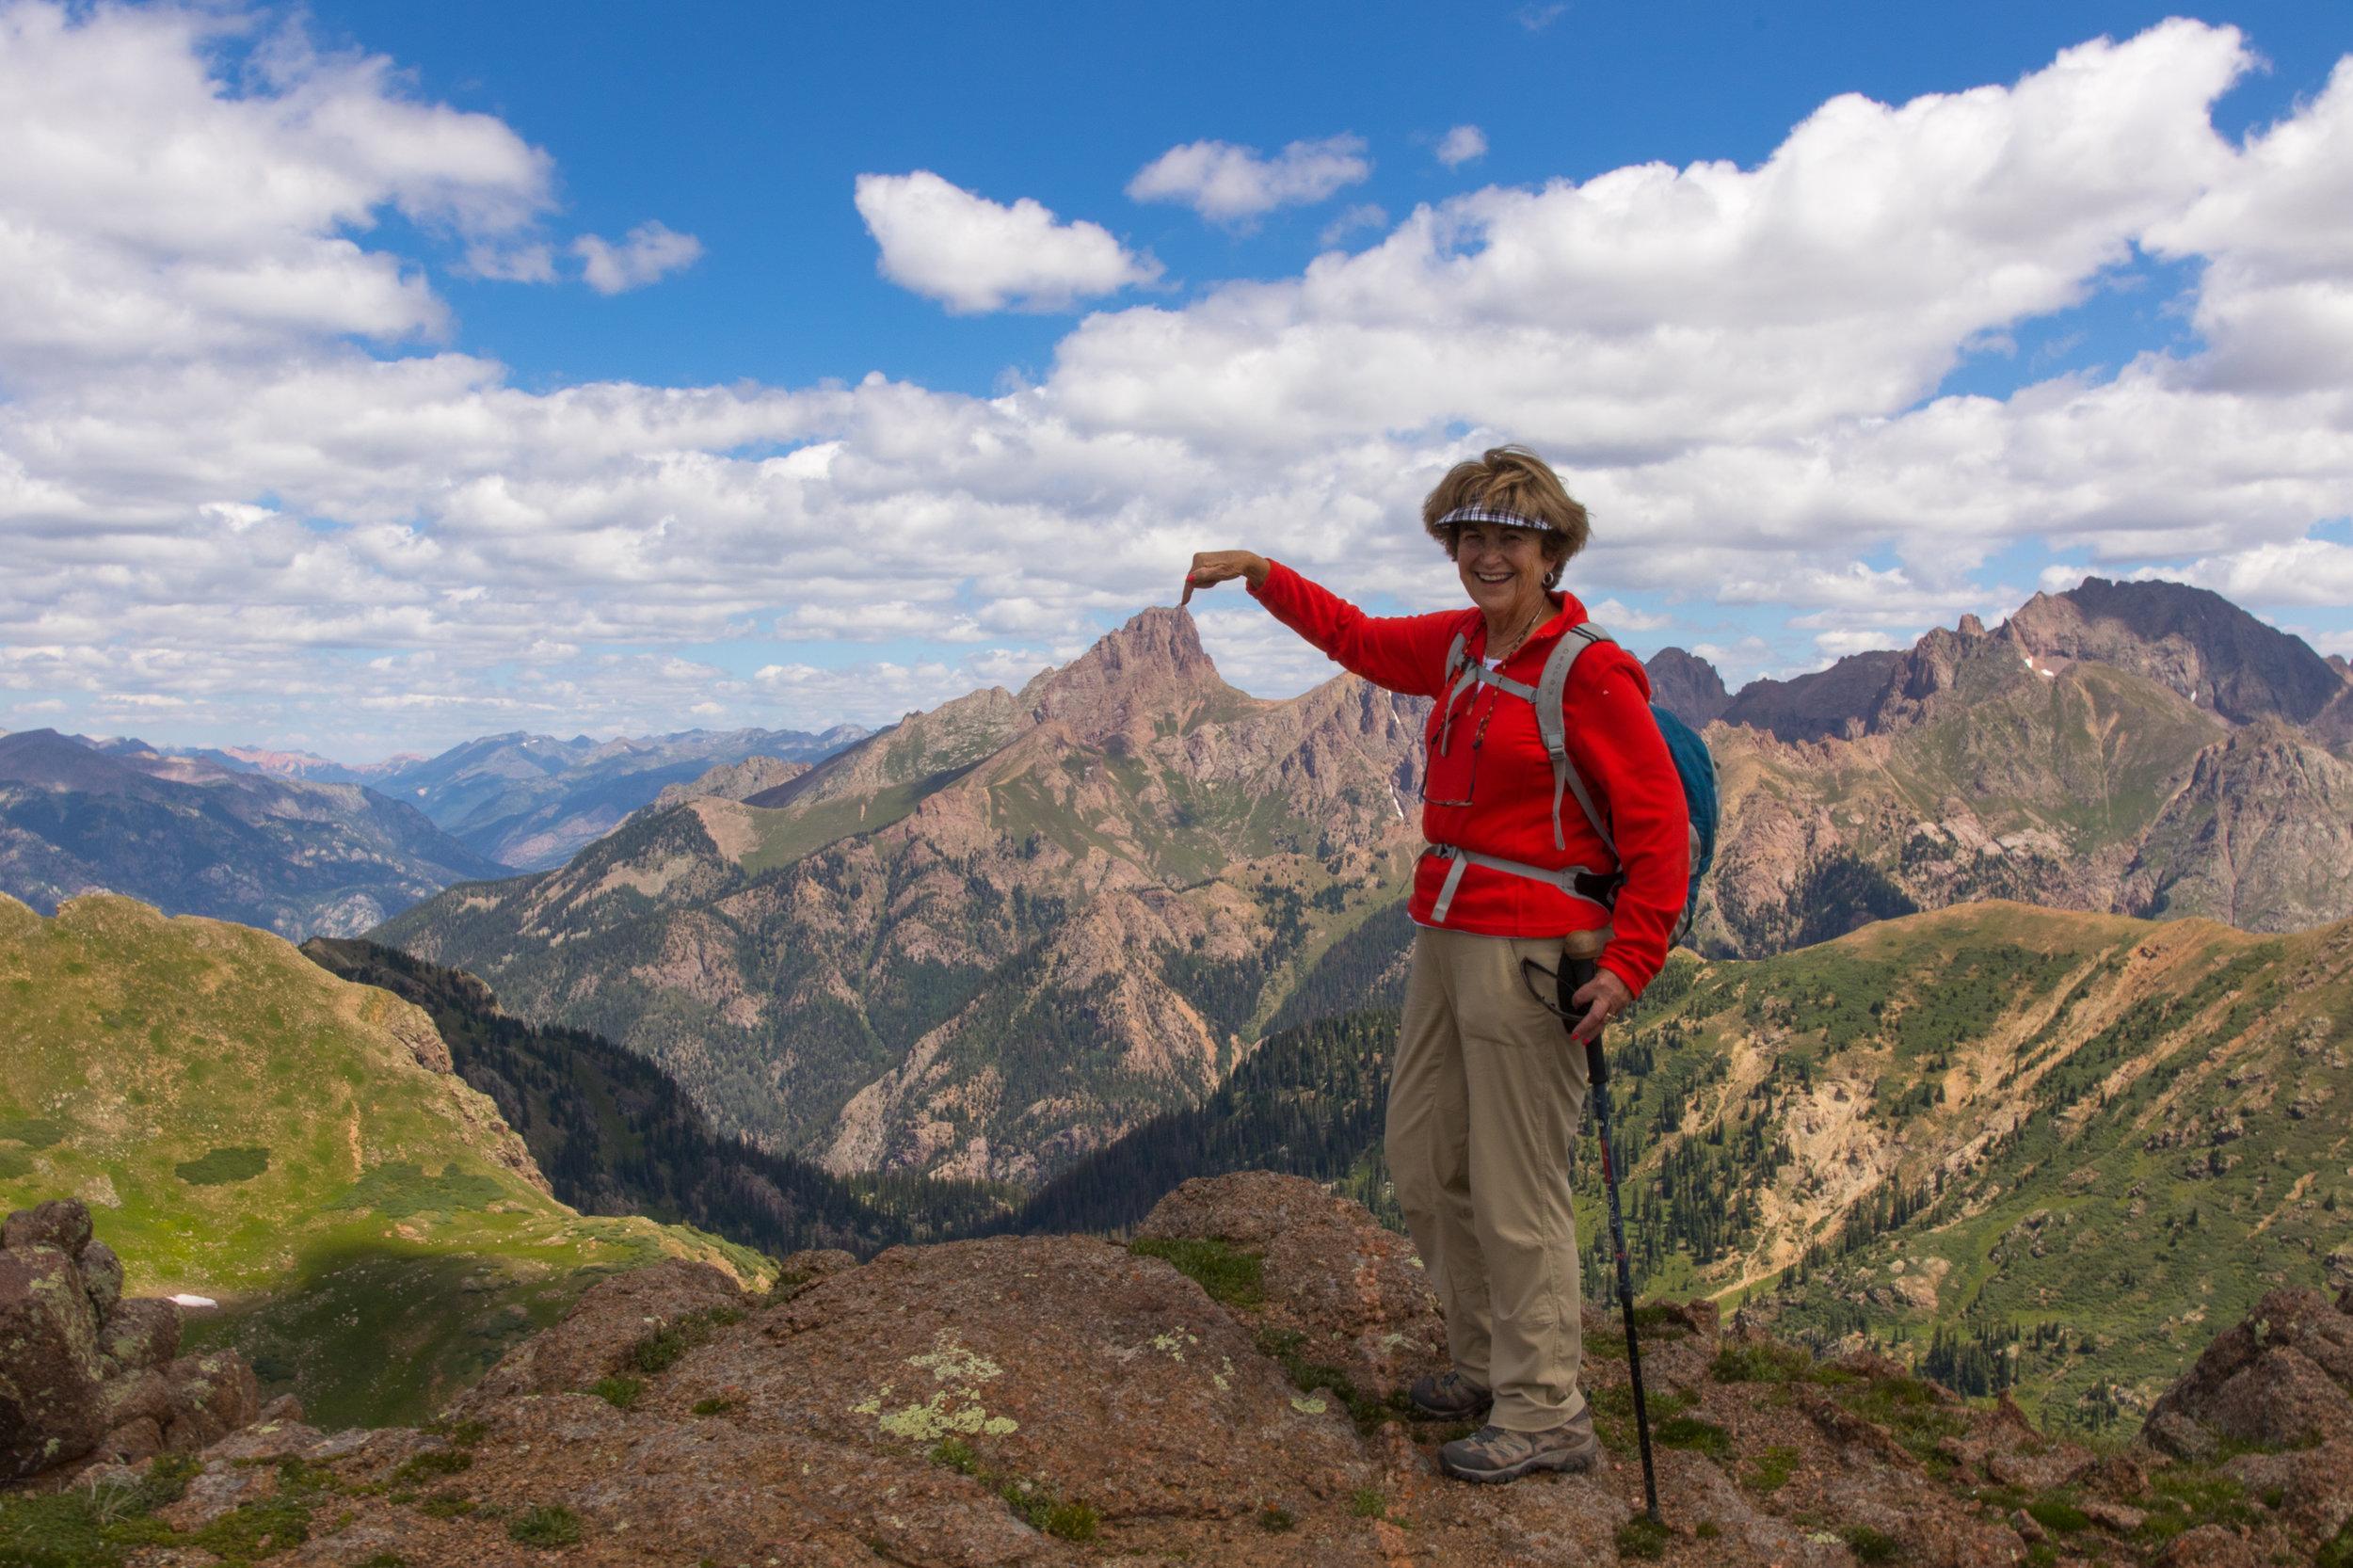 Glenda Touches Pidgeon Peak